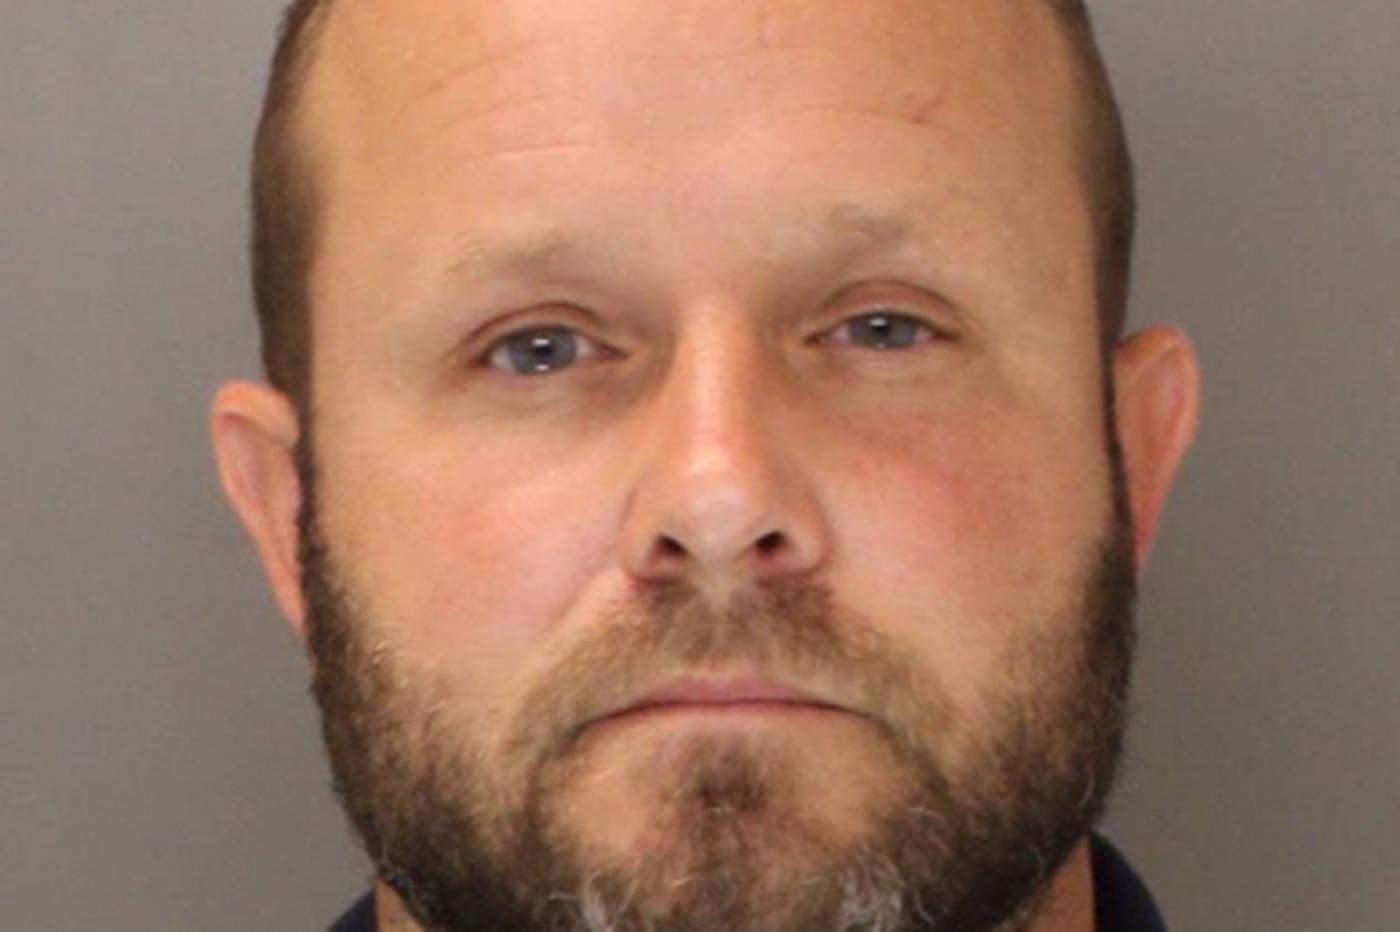 Upper Bucks man charged in crash that killed woman, injured her grandson